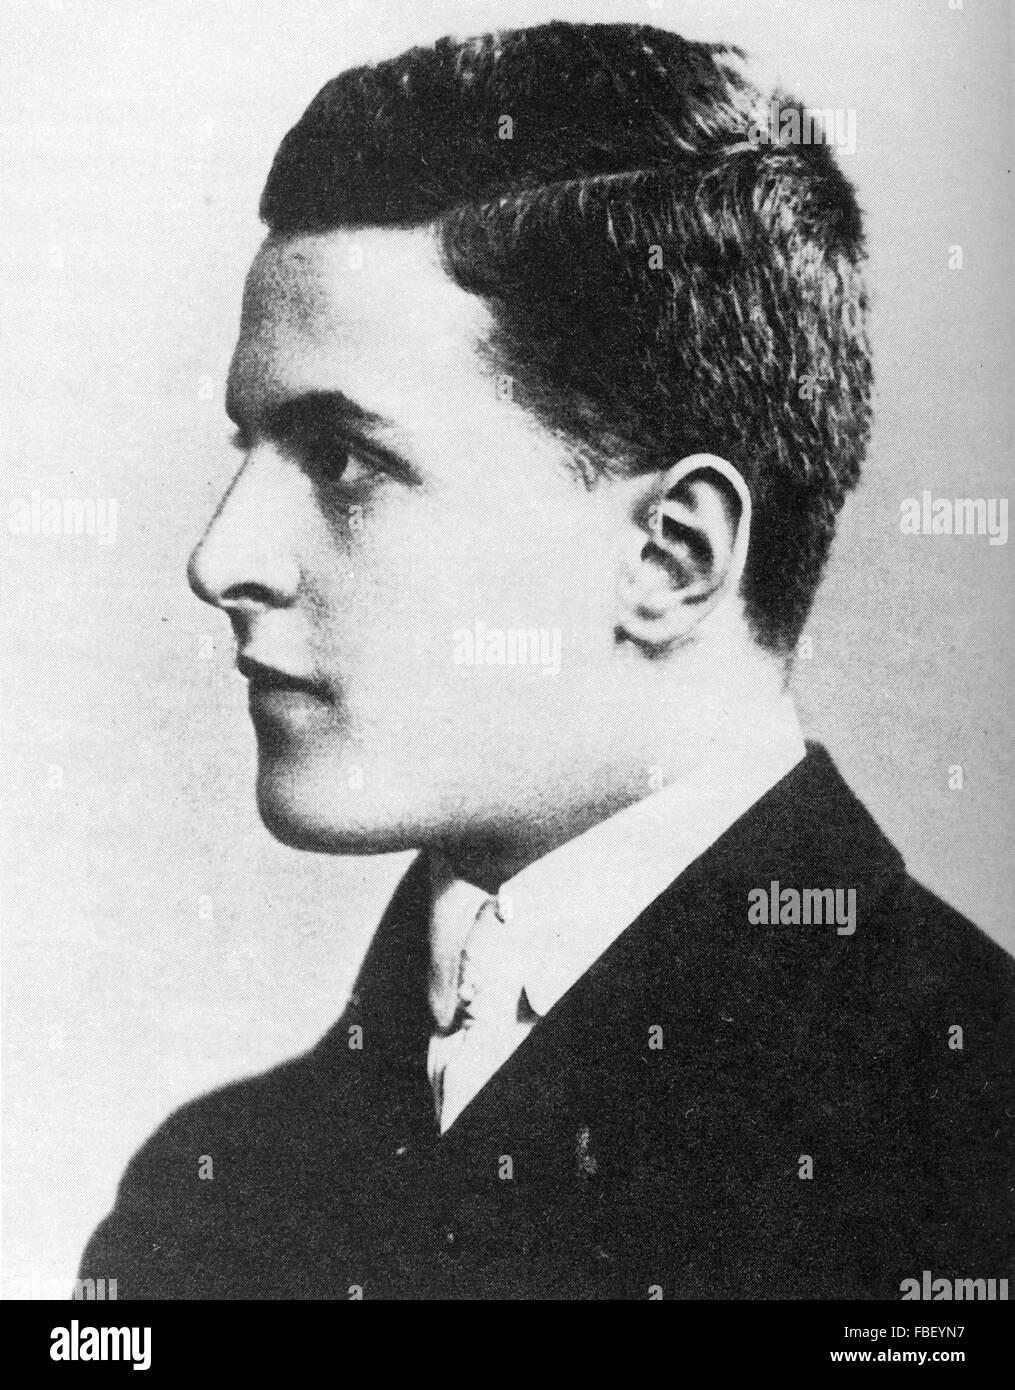 LUDWIG WITTGENSTEIN (1889-1951) Anglo-Austrian philosopher - Stock Image